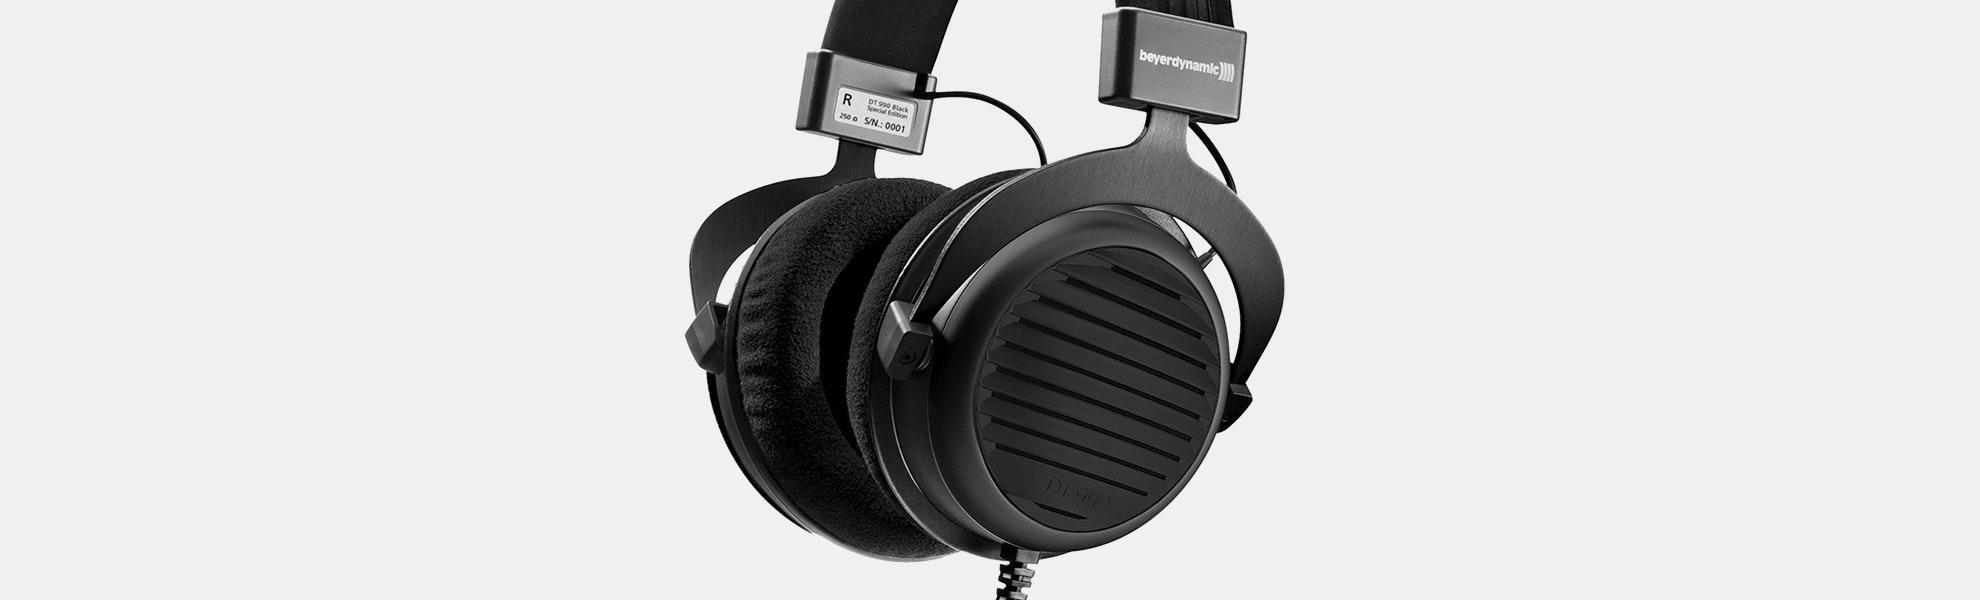 Beyerdynamic DT990 Premium Limited-Edition Black